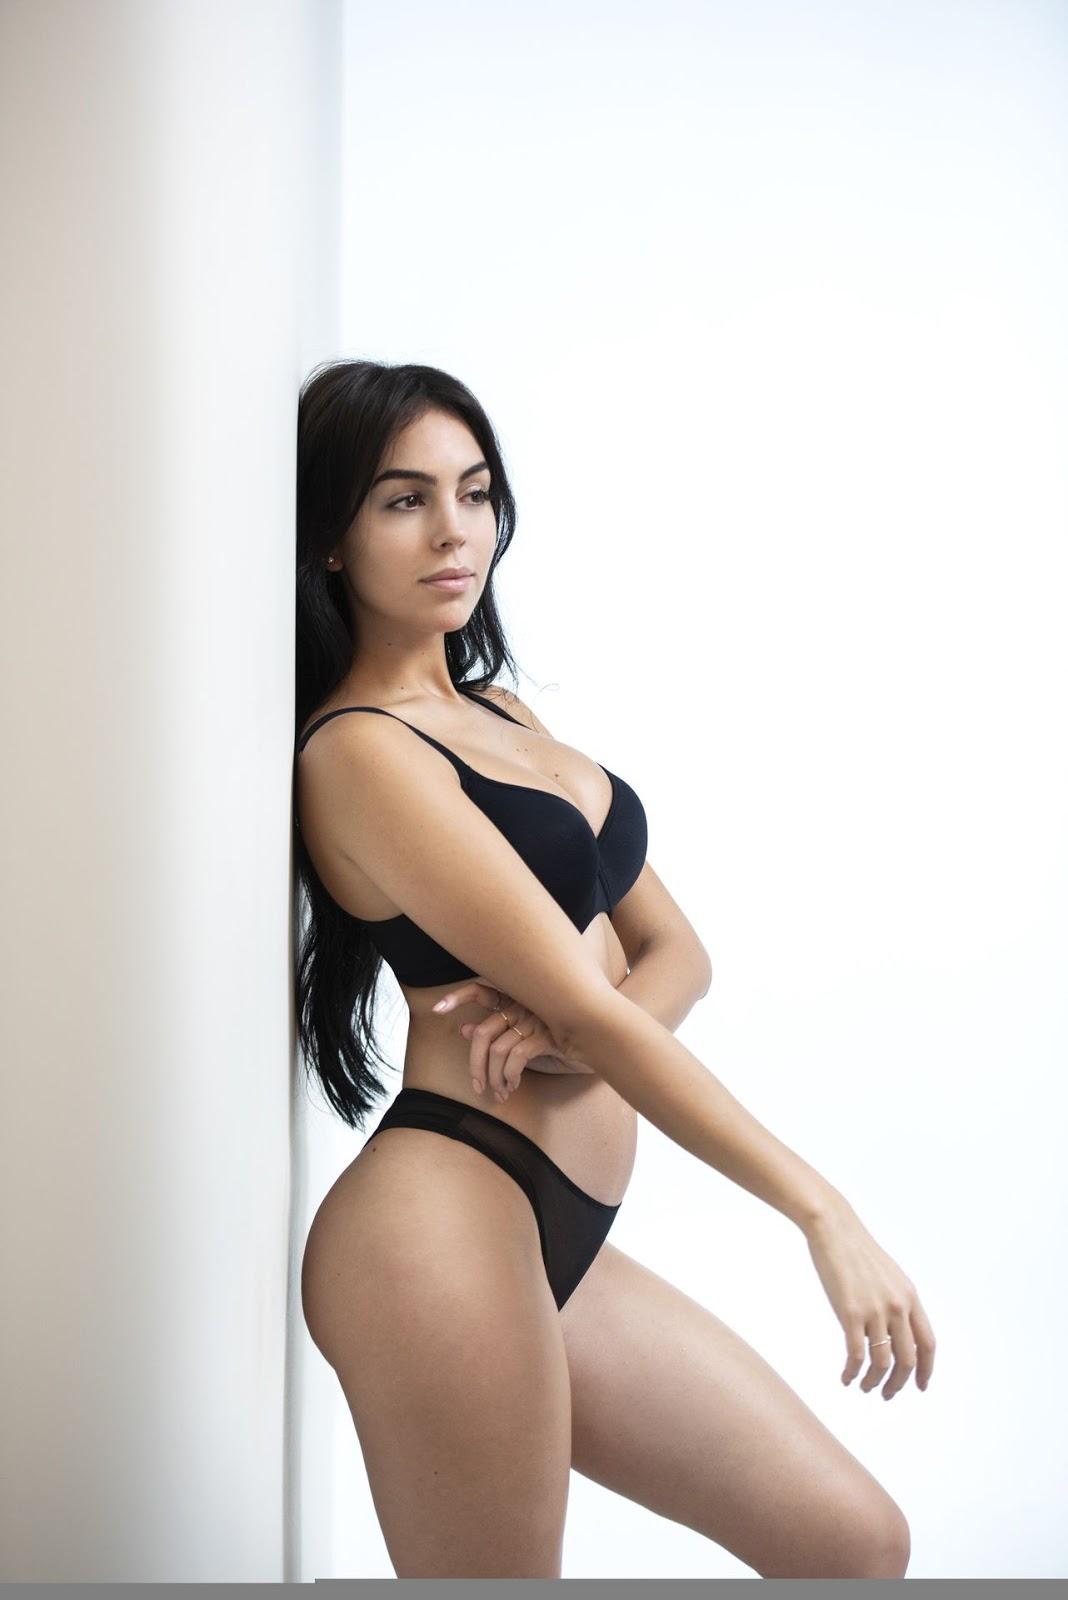 Pics of spanish nudes